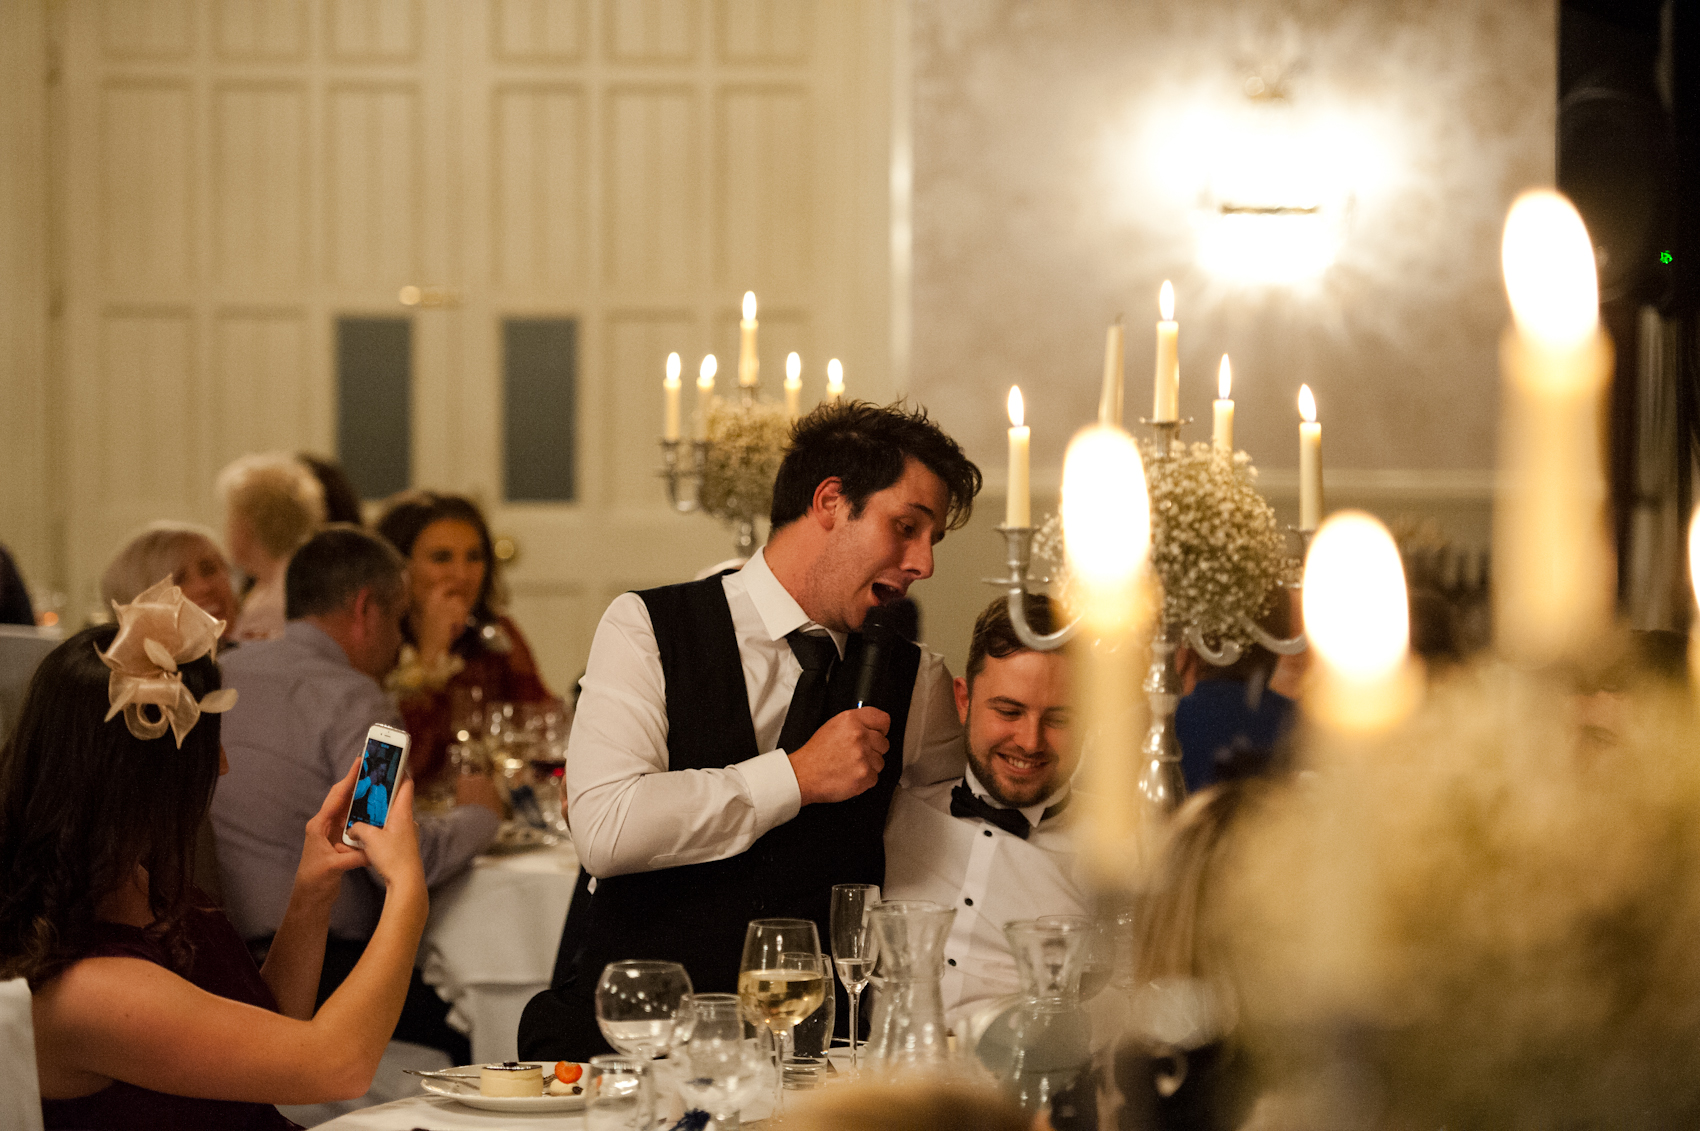 Declan & Emma wedding (23 of 29).jpg